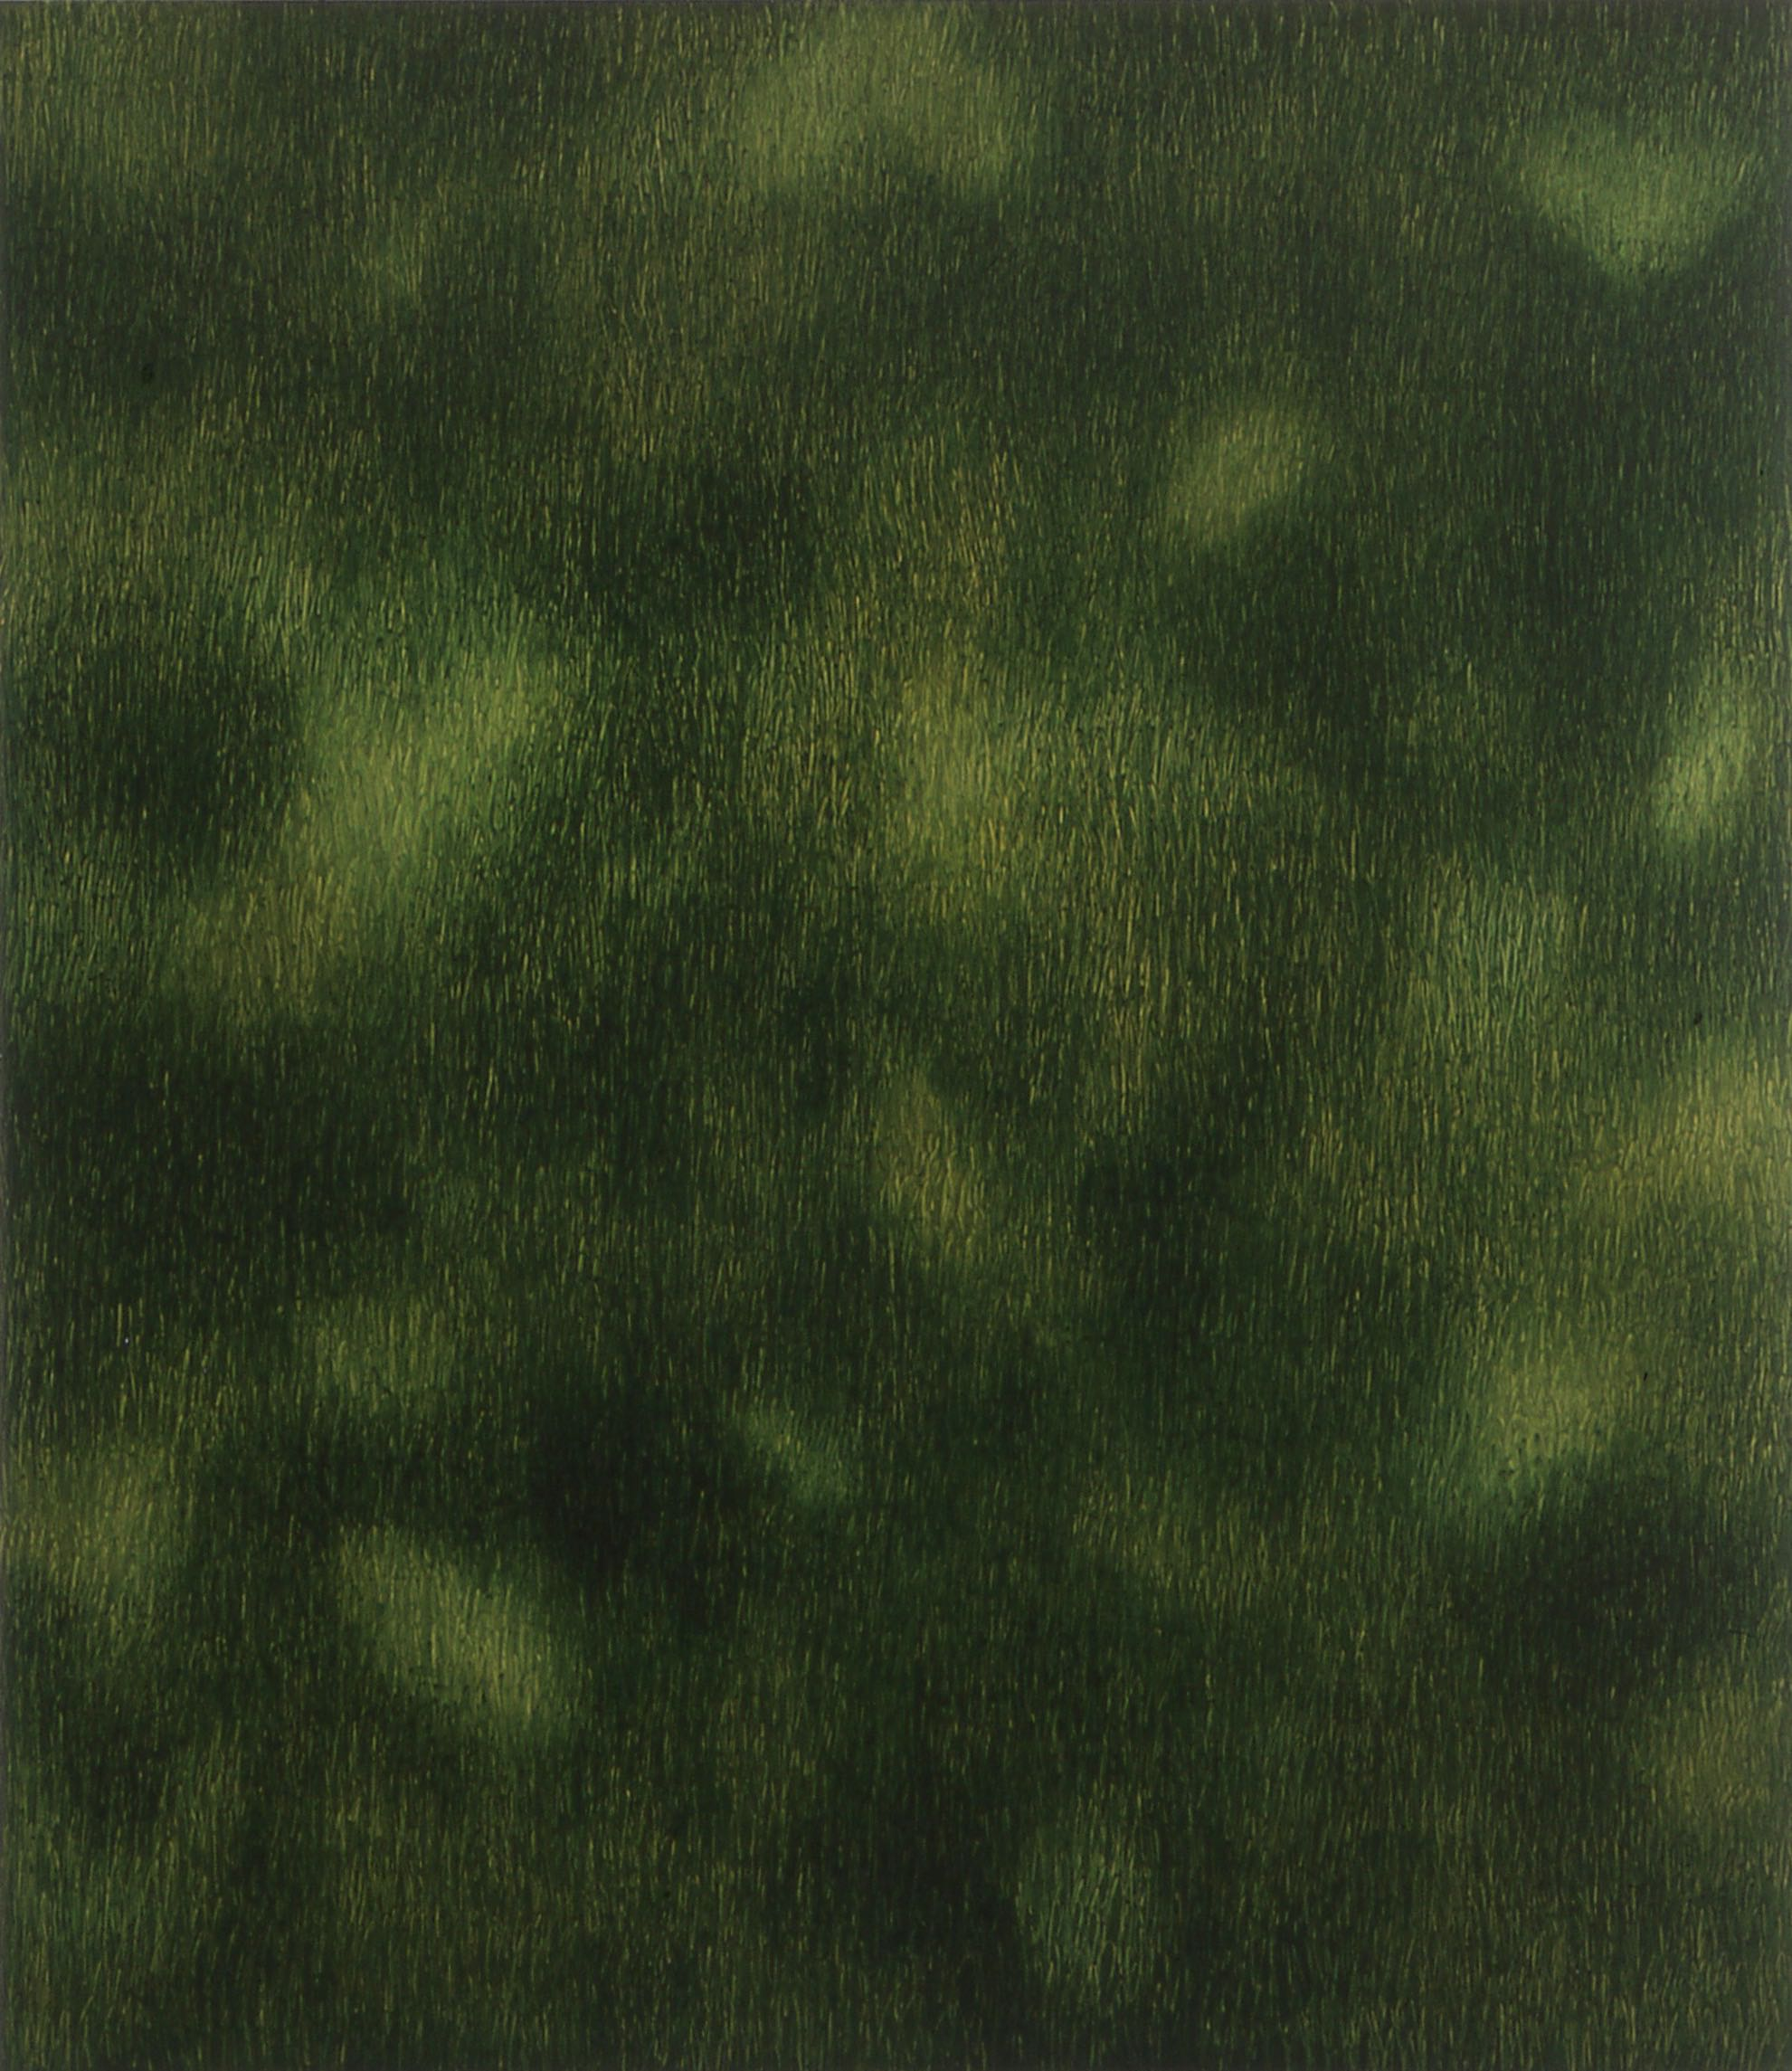 Mørkt gress  170x150cm opl 2000